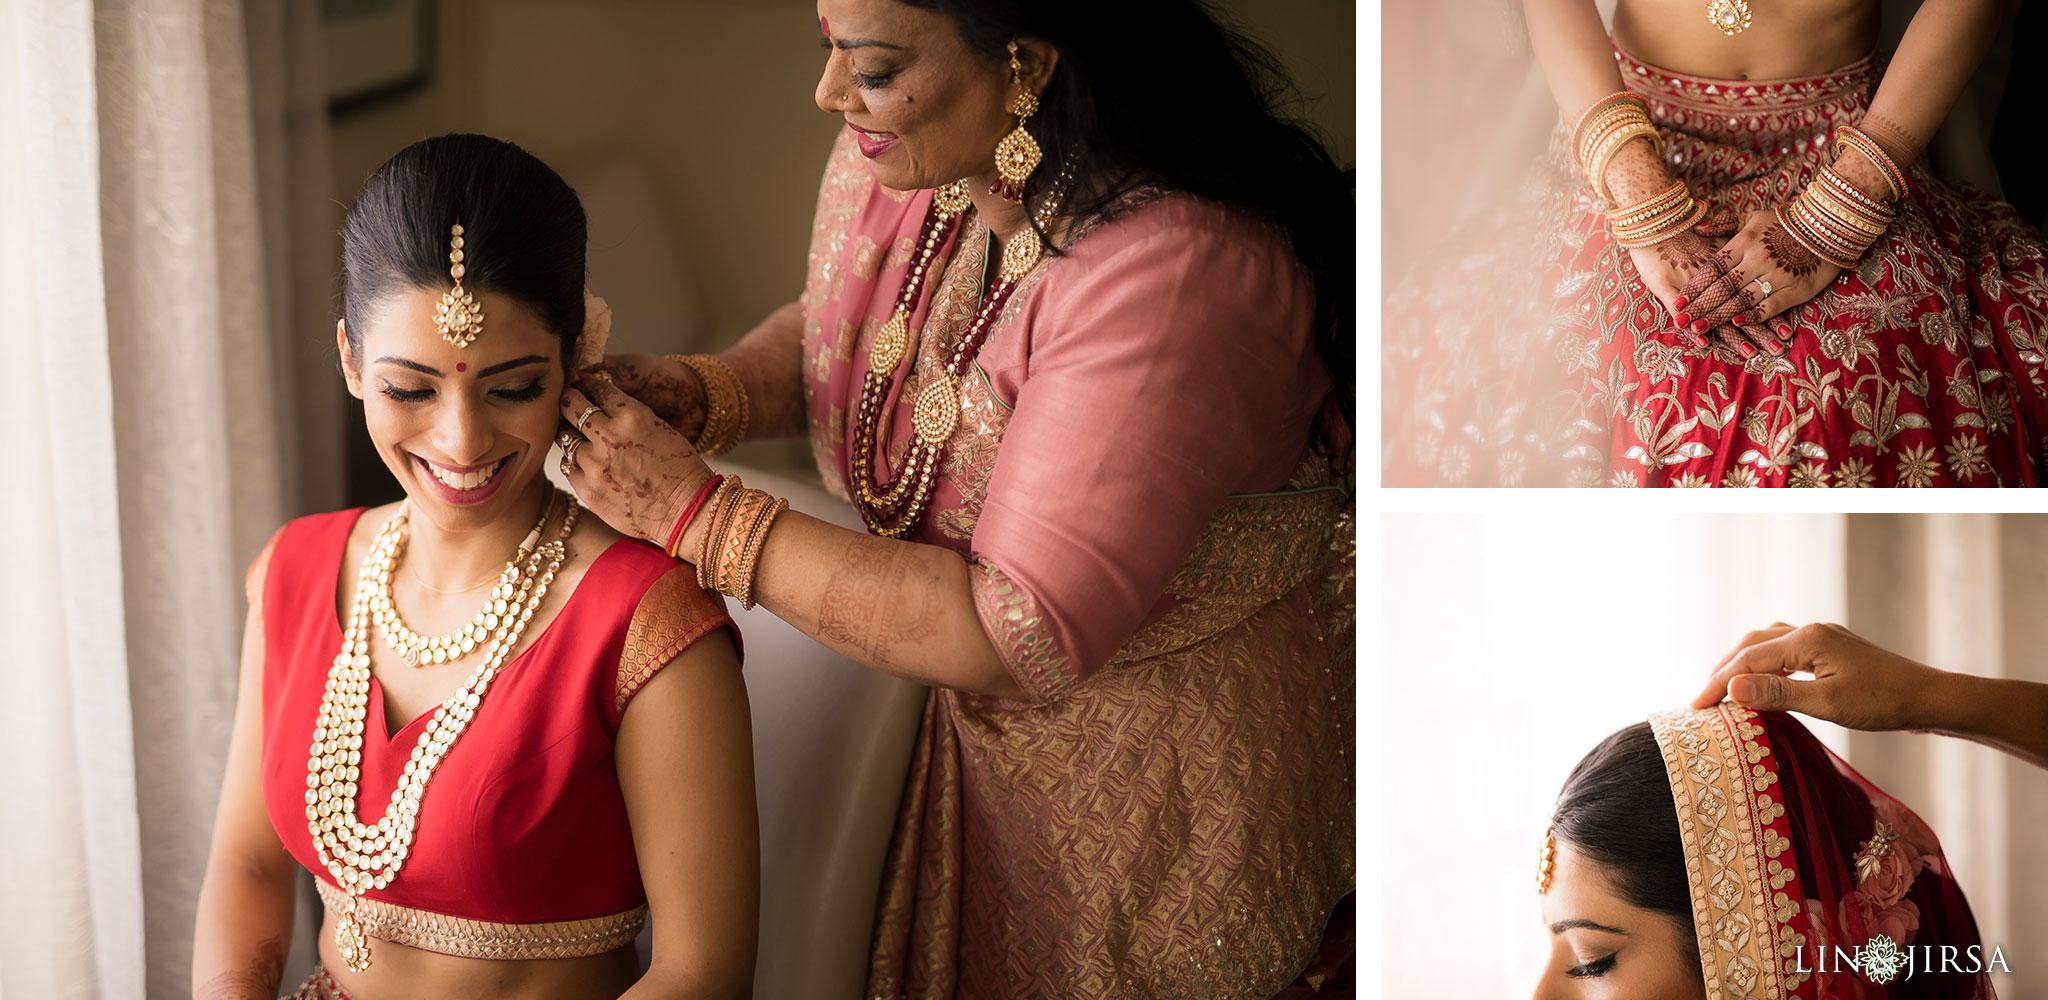 04 ritz carlton laguna niguel indian bride wedding photography